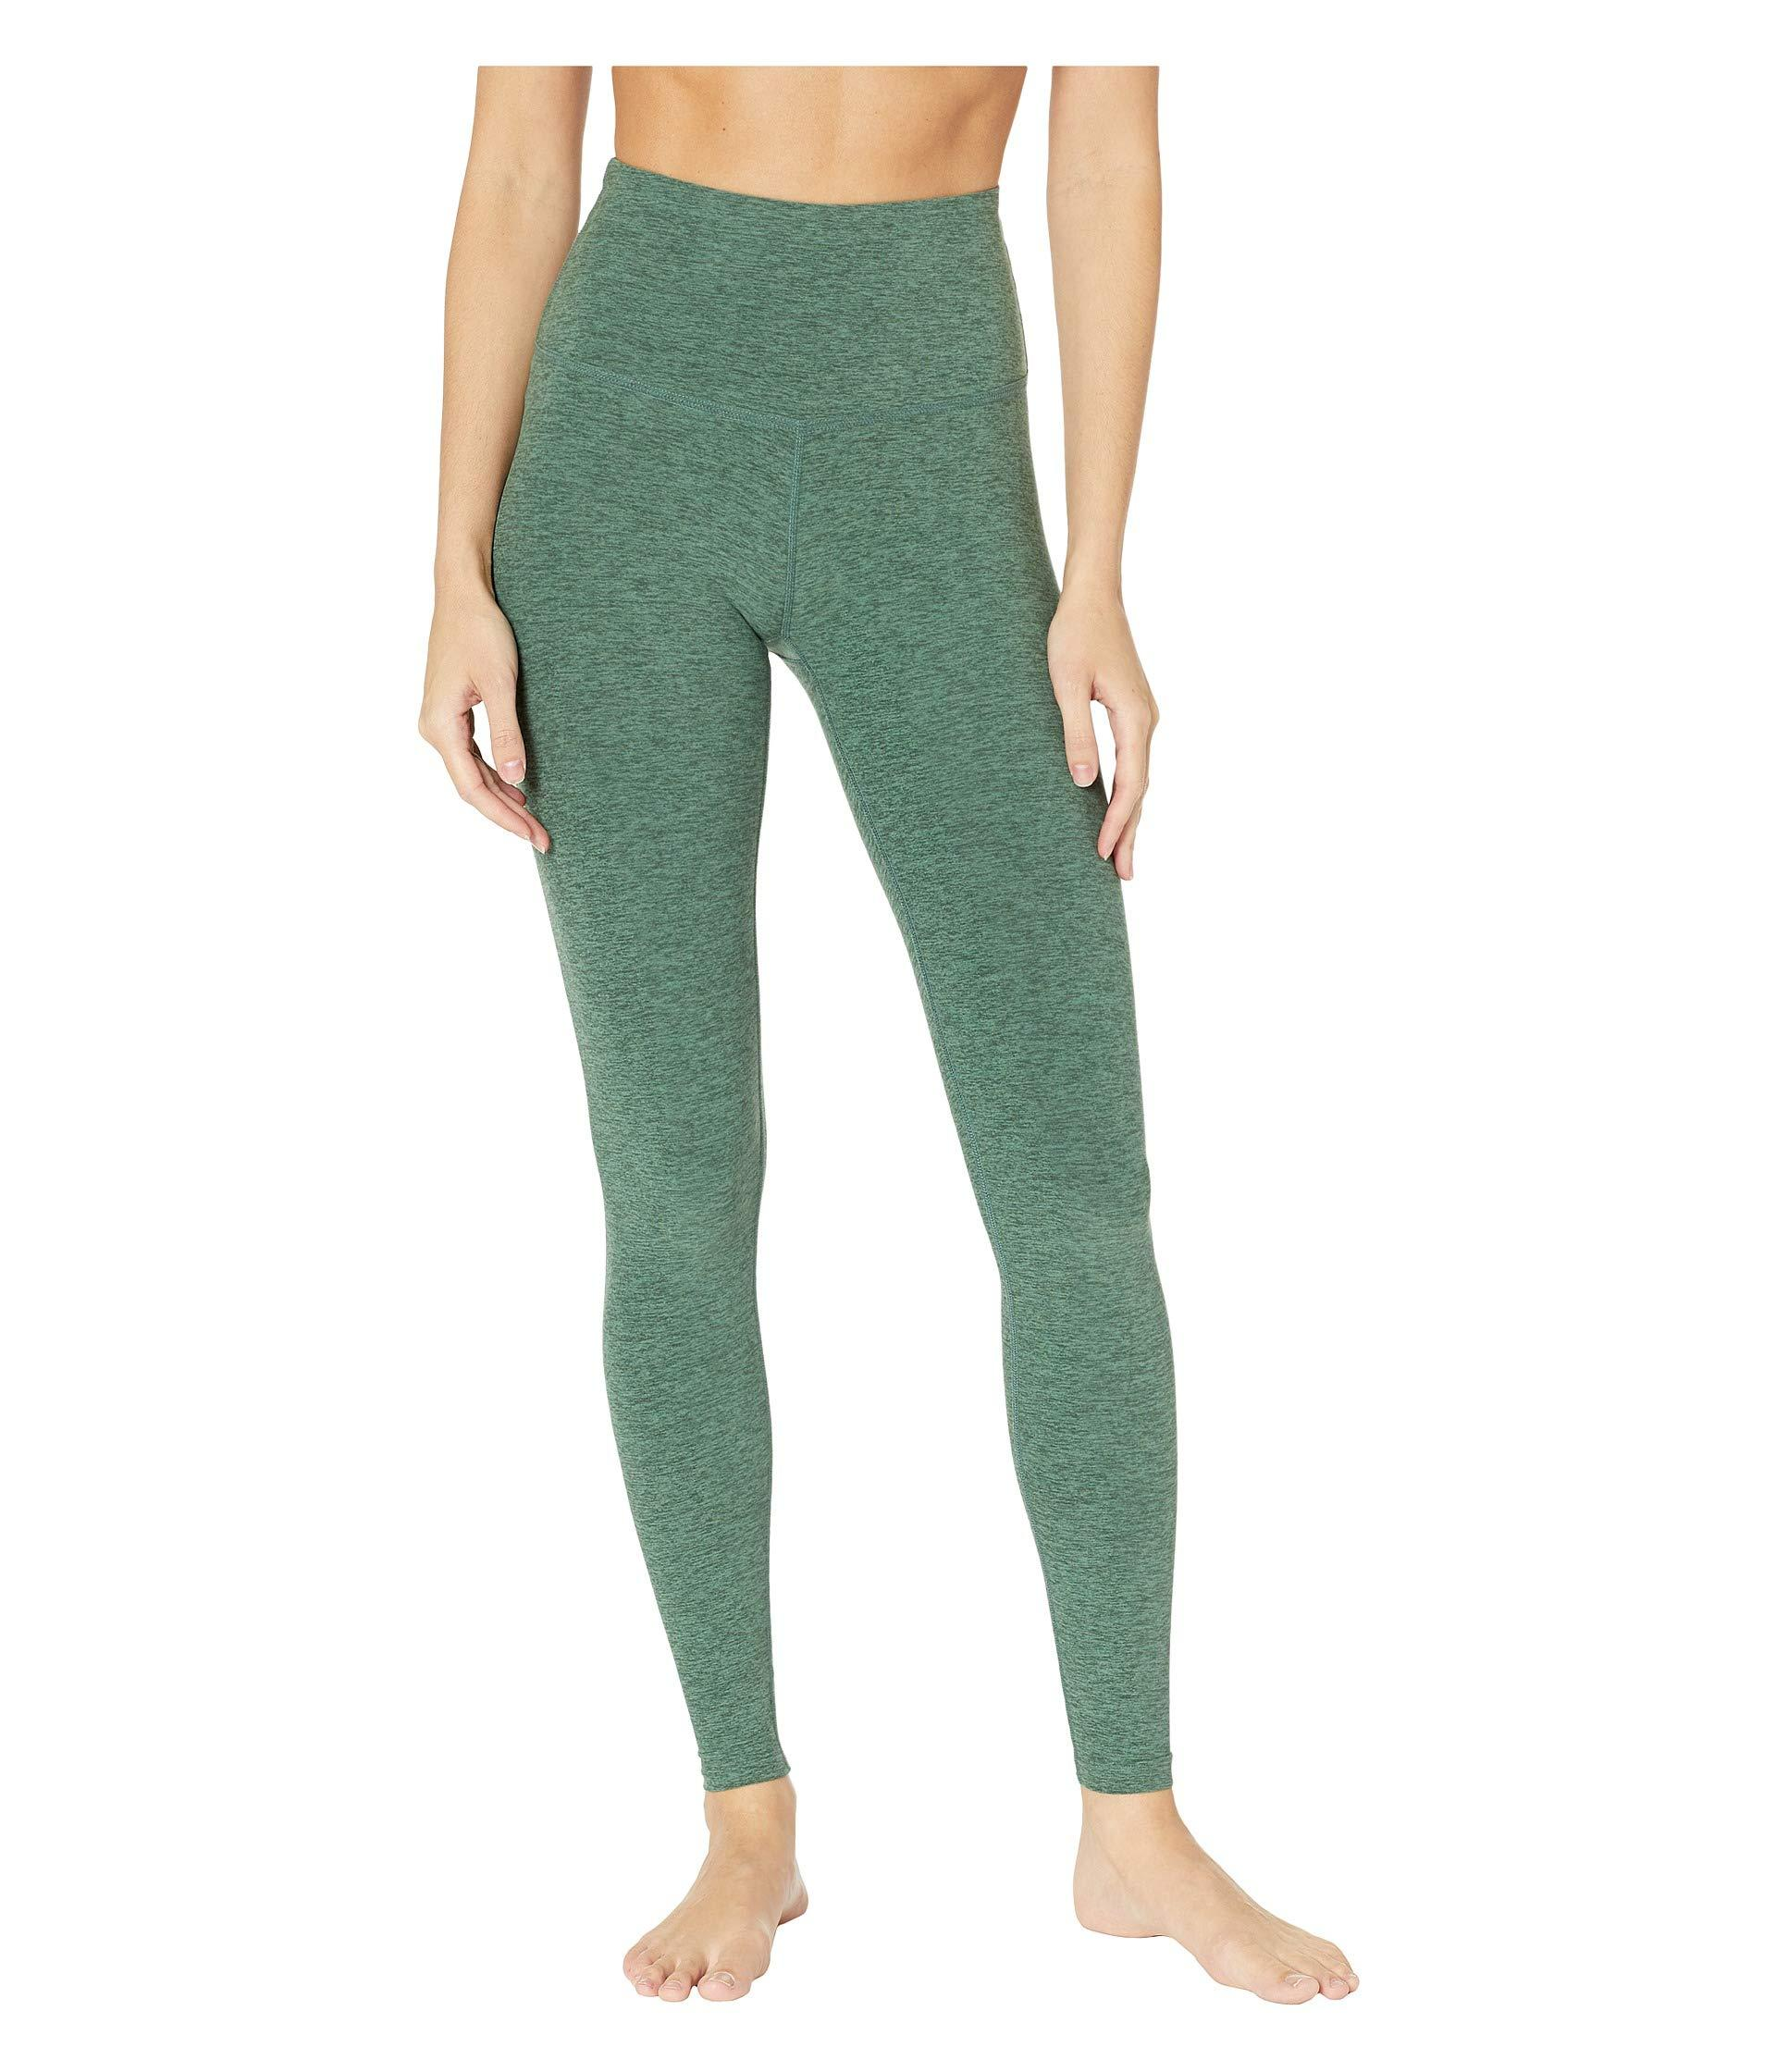 385ada63c3cbc Beyond Yoga. Green High Waist Long Legging (black/white) Women's Workout